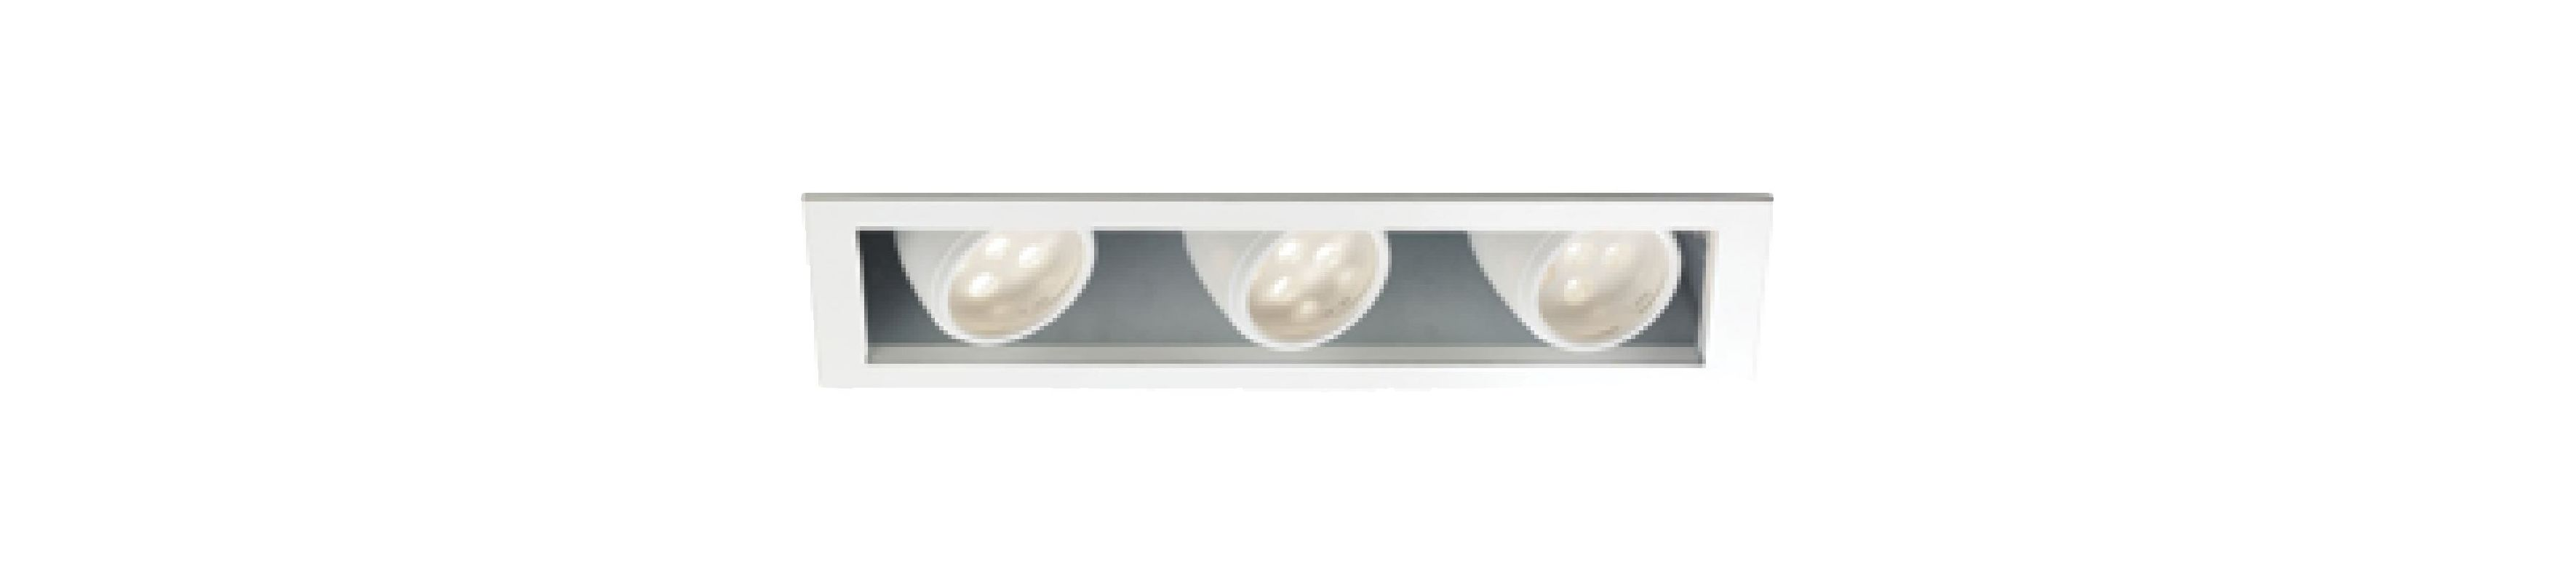 WAC Lighting MT-LED318F-CWHS Multiple Spot 4500K High Output LED